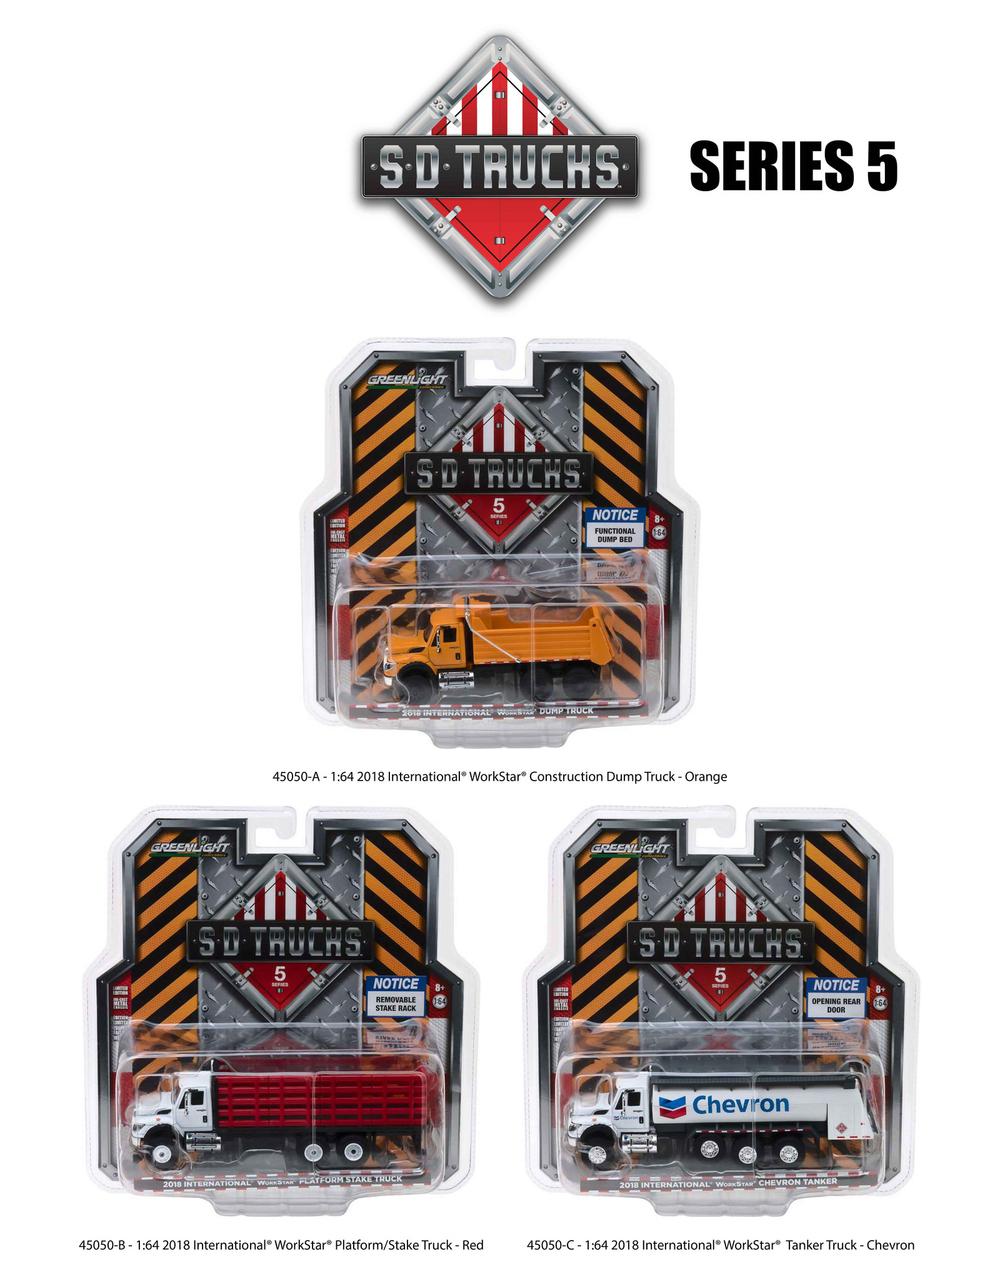 2018 International Workstar Trucks Set Of 3 S.D. Trucks Series 5 1/64 Diecast Models By Greenlight